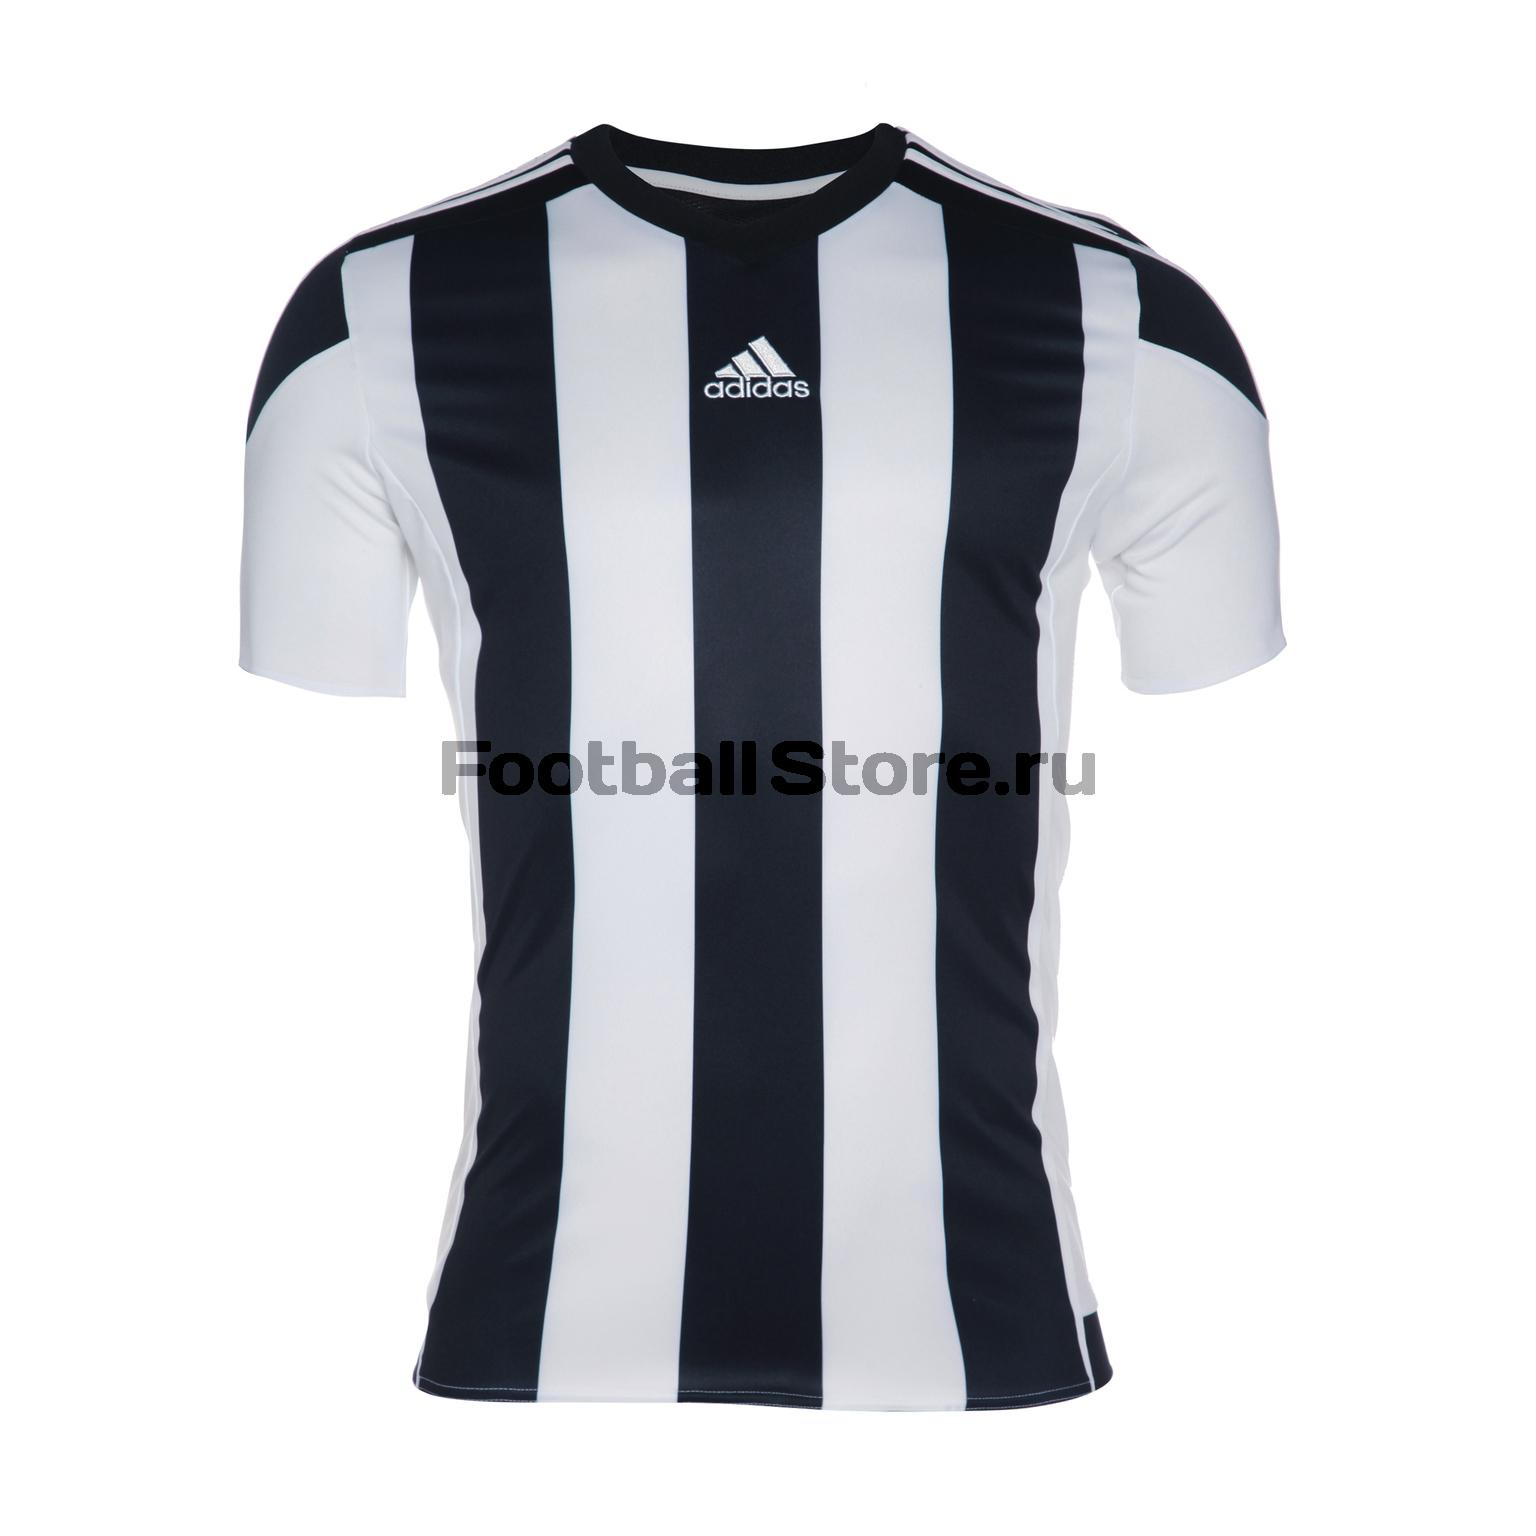 Футболка игровая Adidas Striped 15 JSY M62777 striped longline tshirt